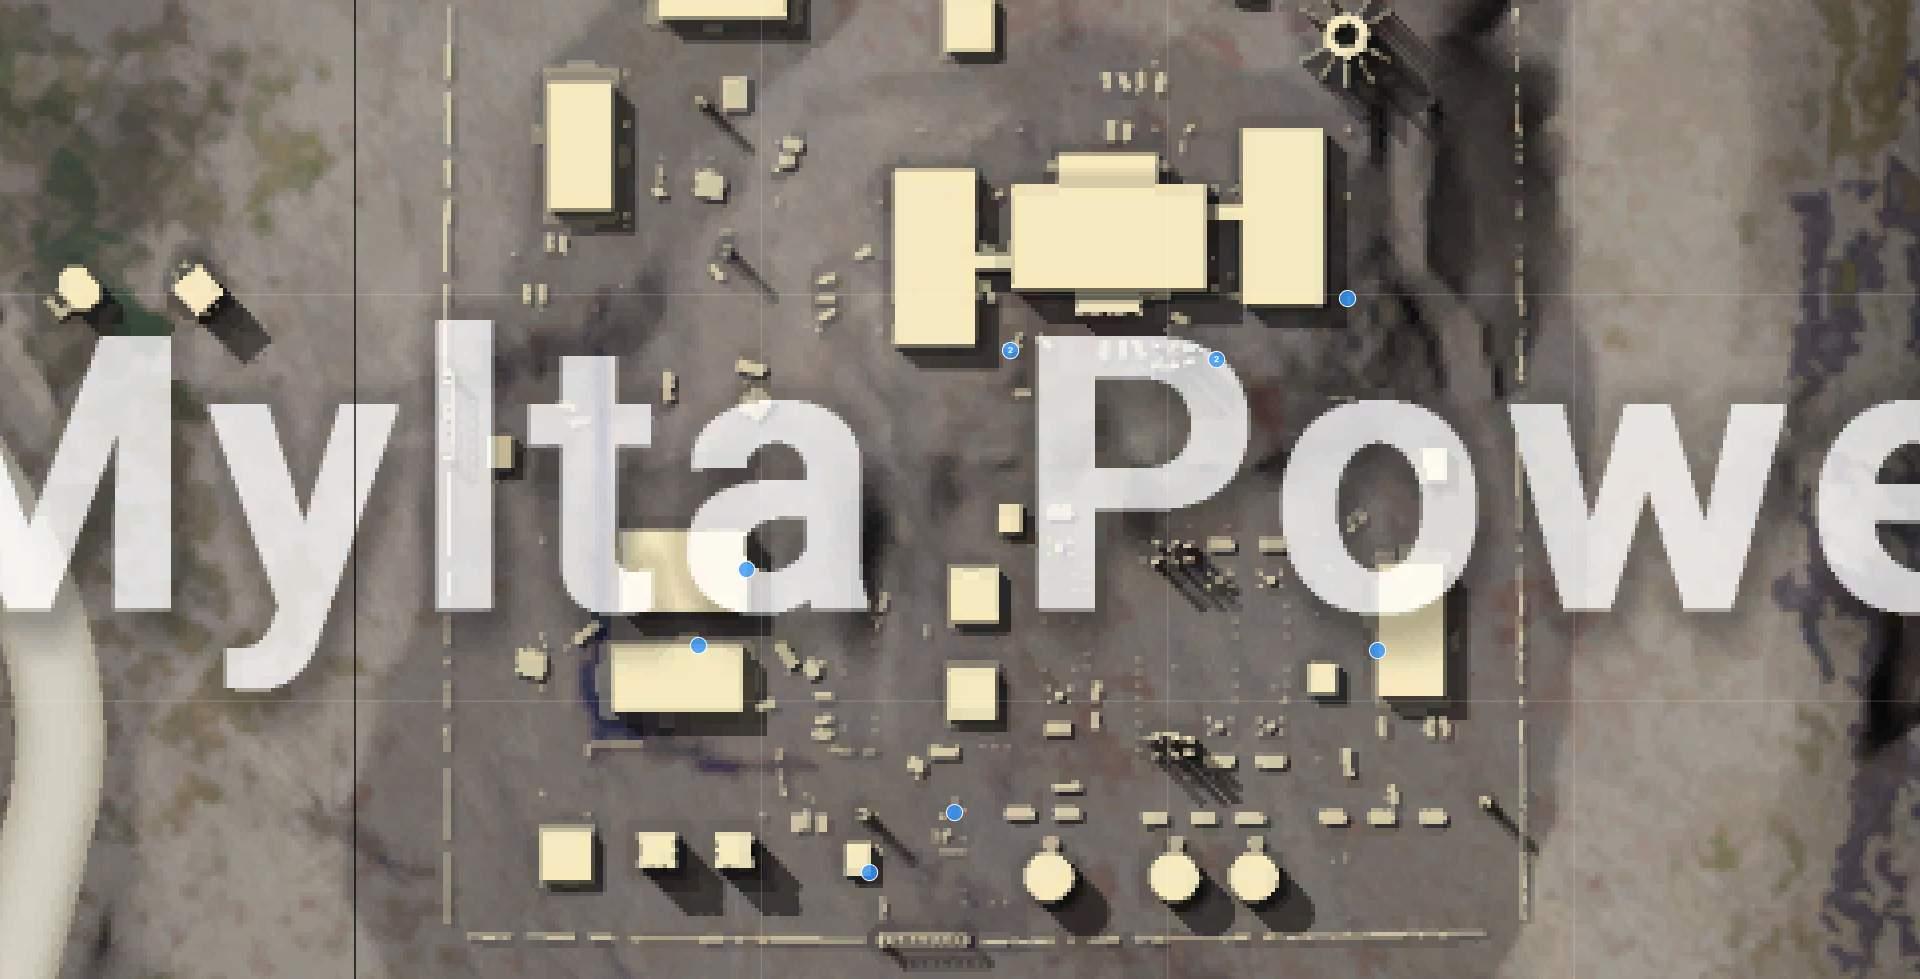 PUBG - CCTV Camera Locations (Season 6)